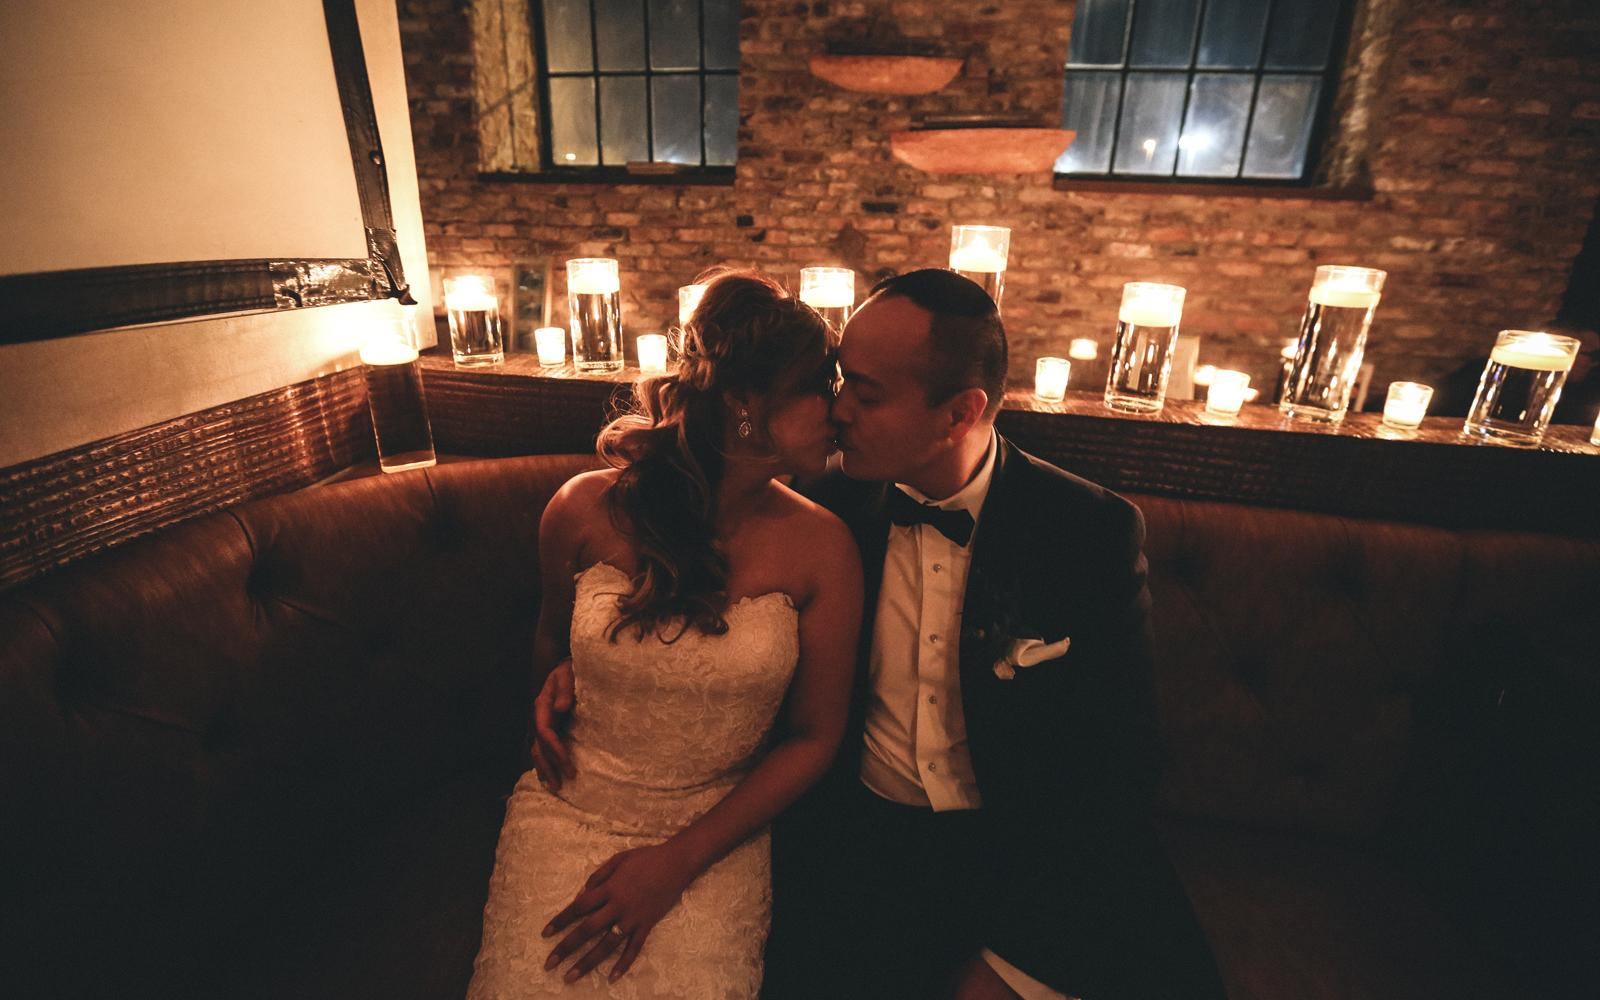 roma-and-dale-wedding-day-sneak-peak-34.jpg